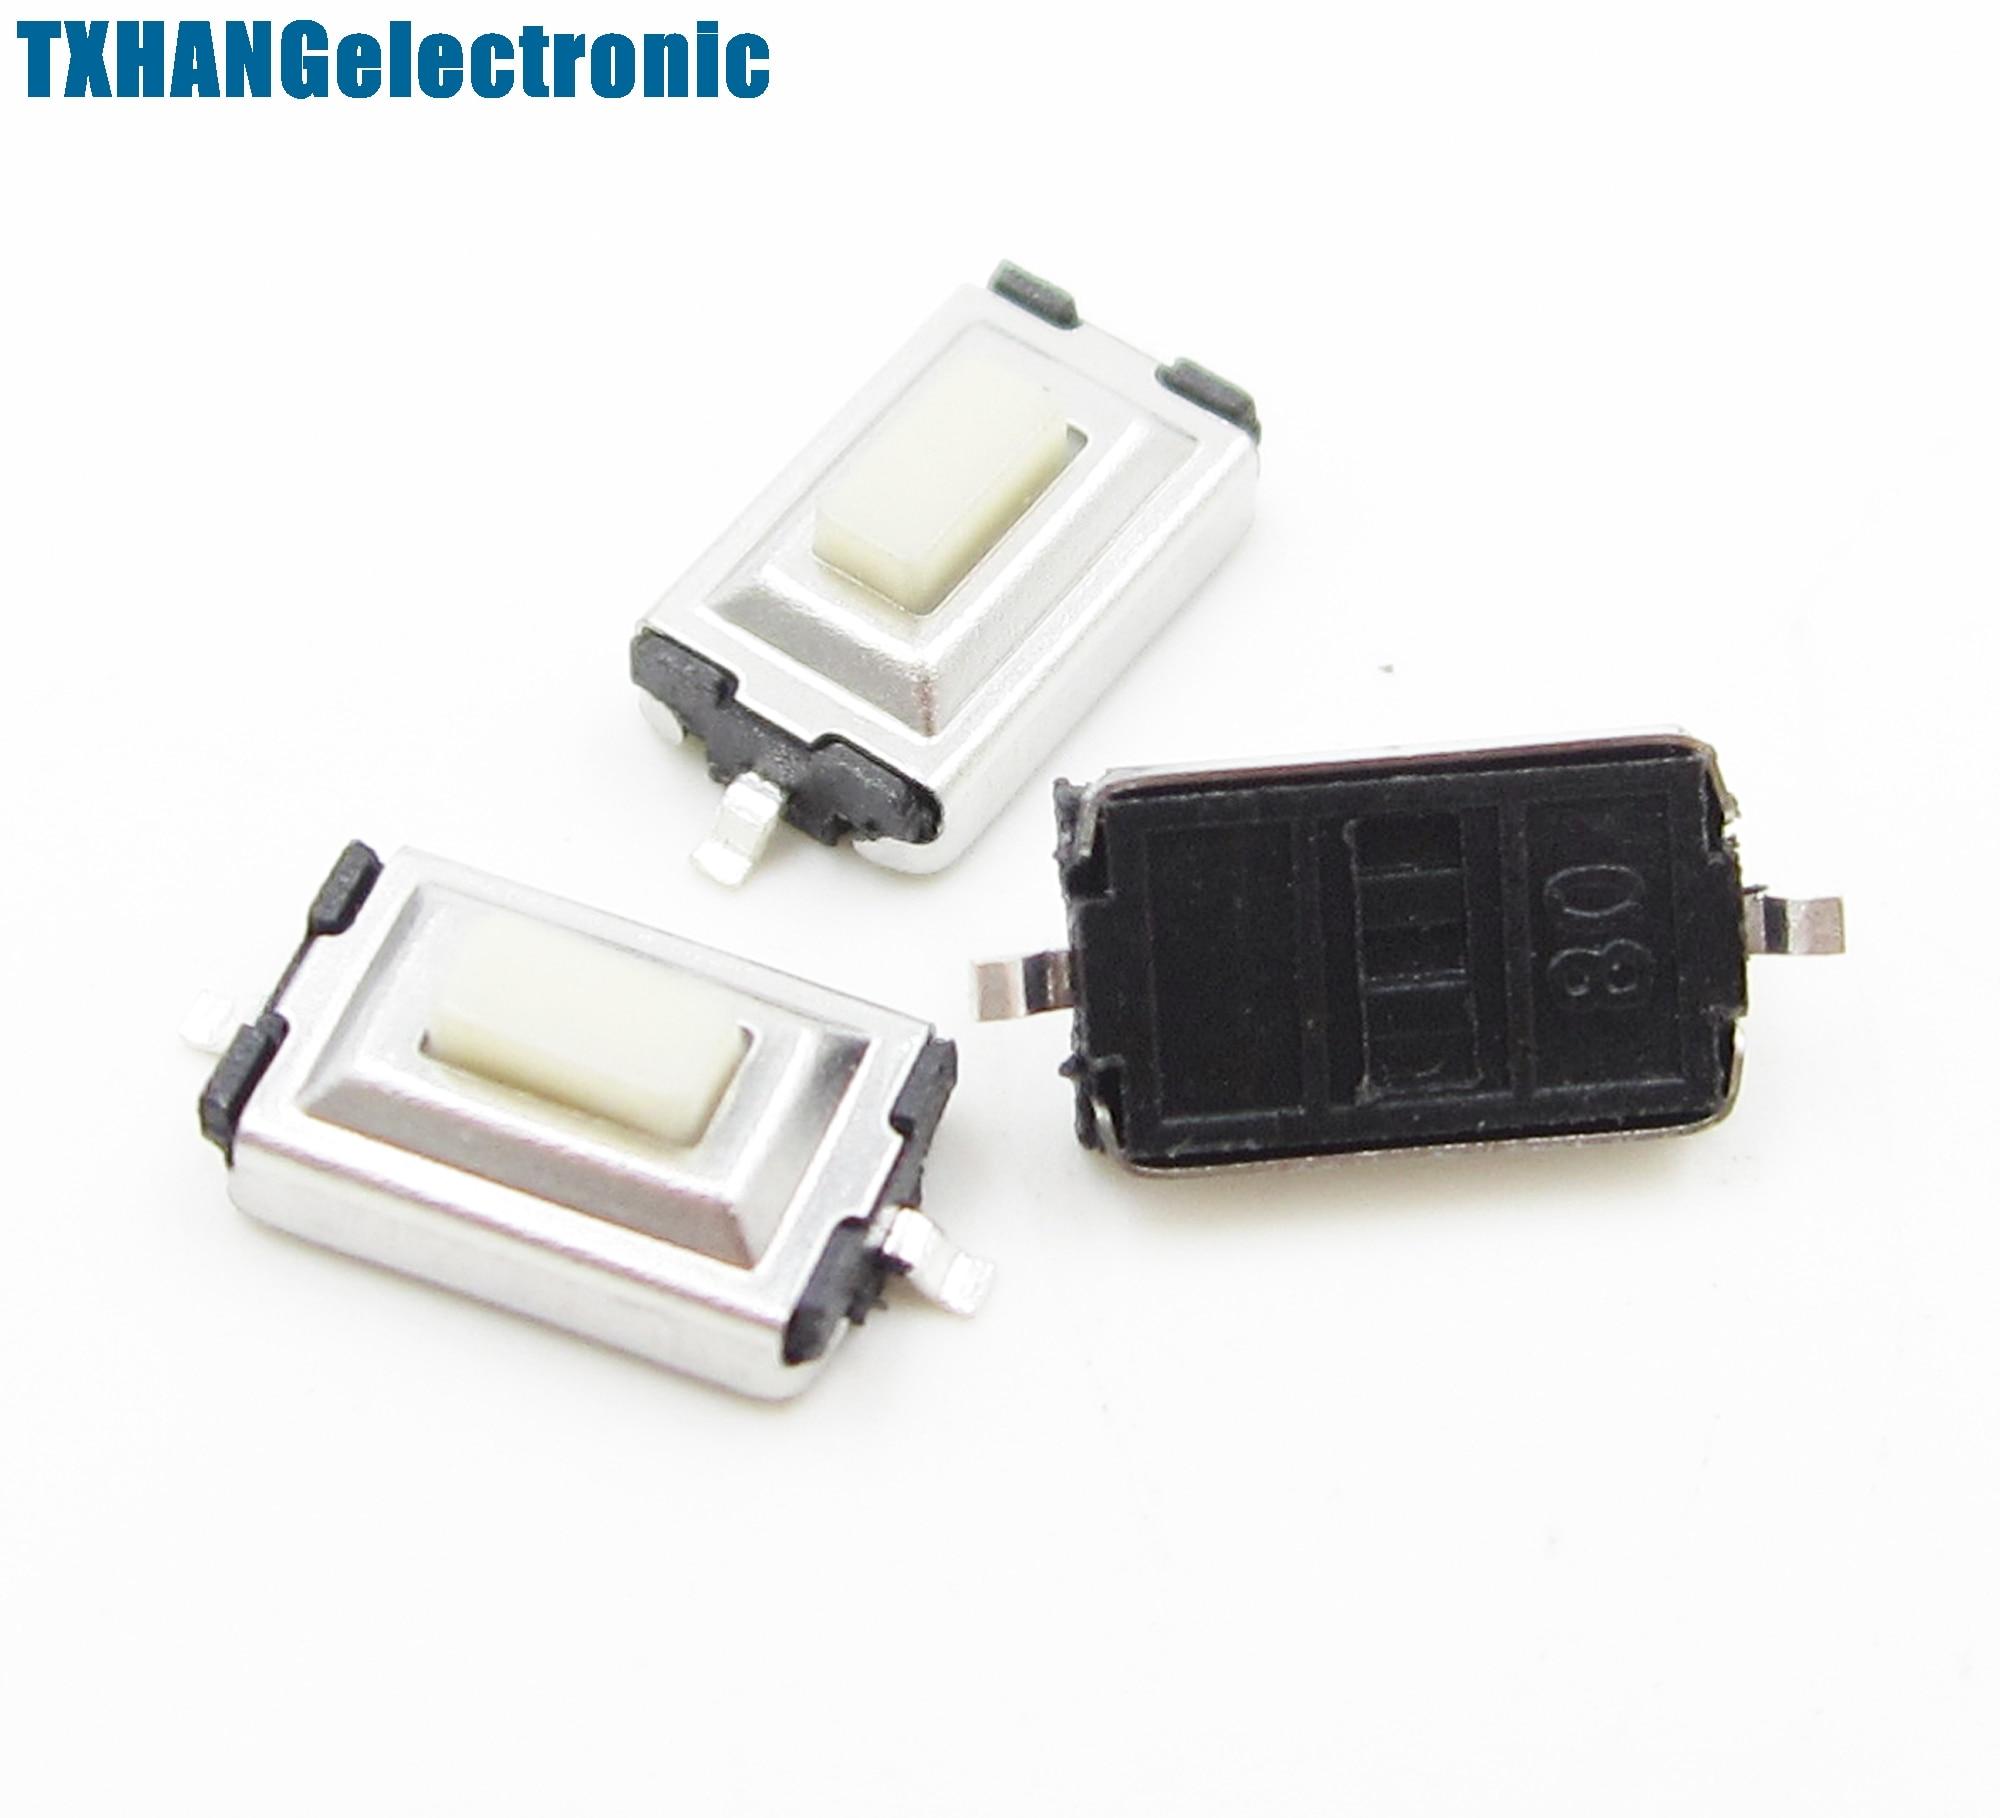 20pcs 3X6X2.5mm Tactile Push Button Switch Tact Switch Micro Switch 2-Pin SMD